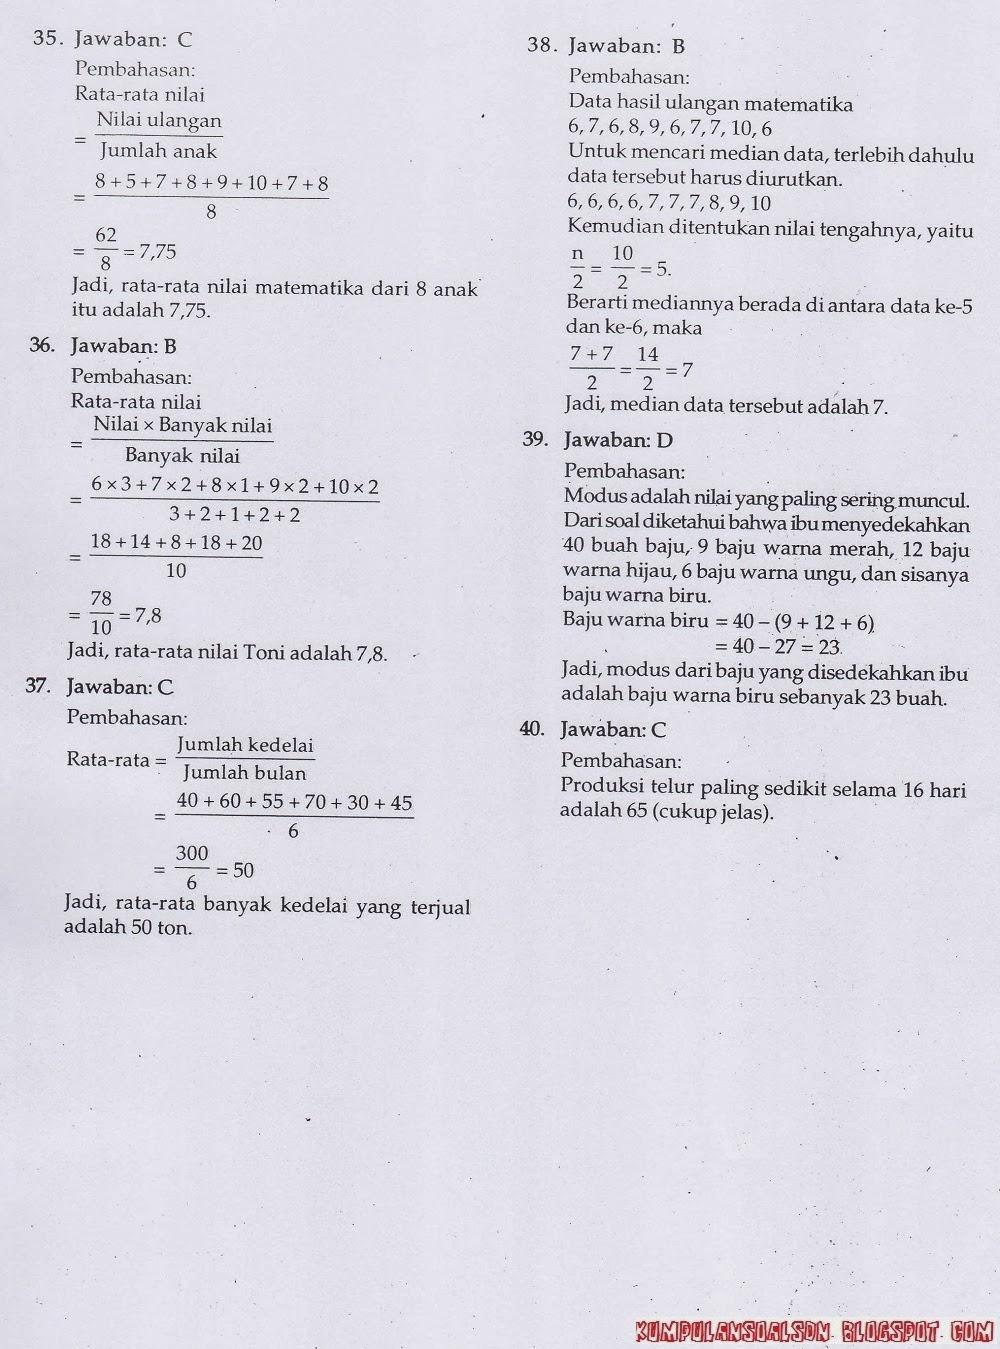 Soal Ujian Bahasa Indonesia Kls 6 Newhairstylesformen2014 Com